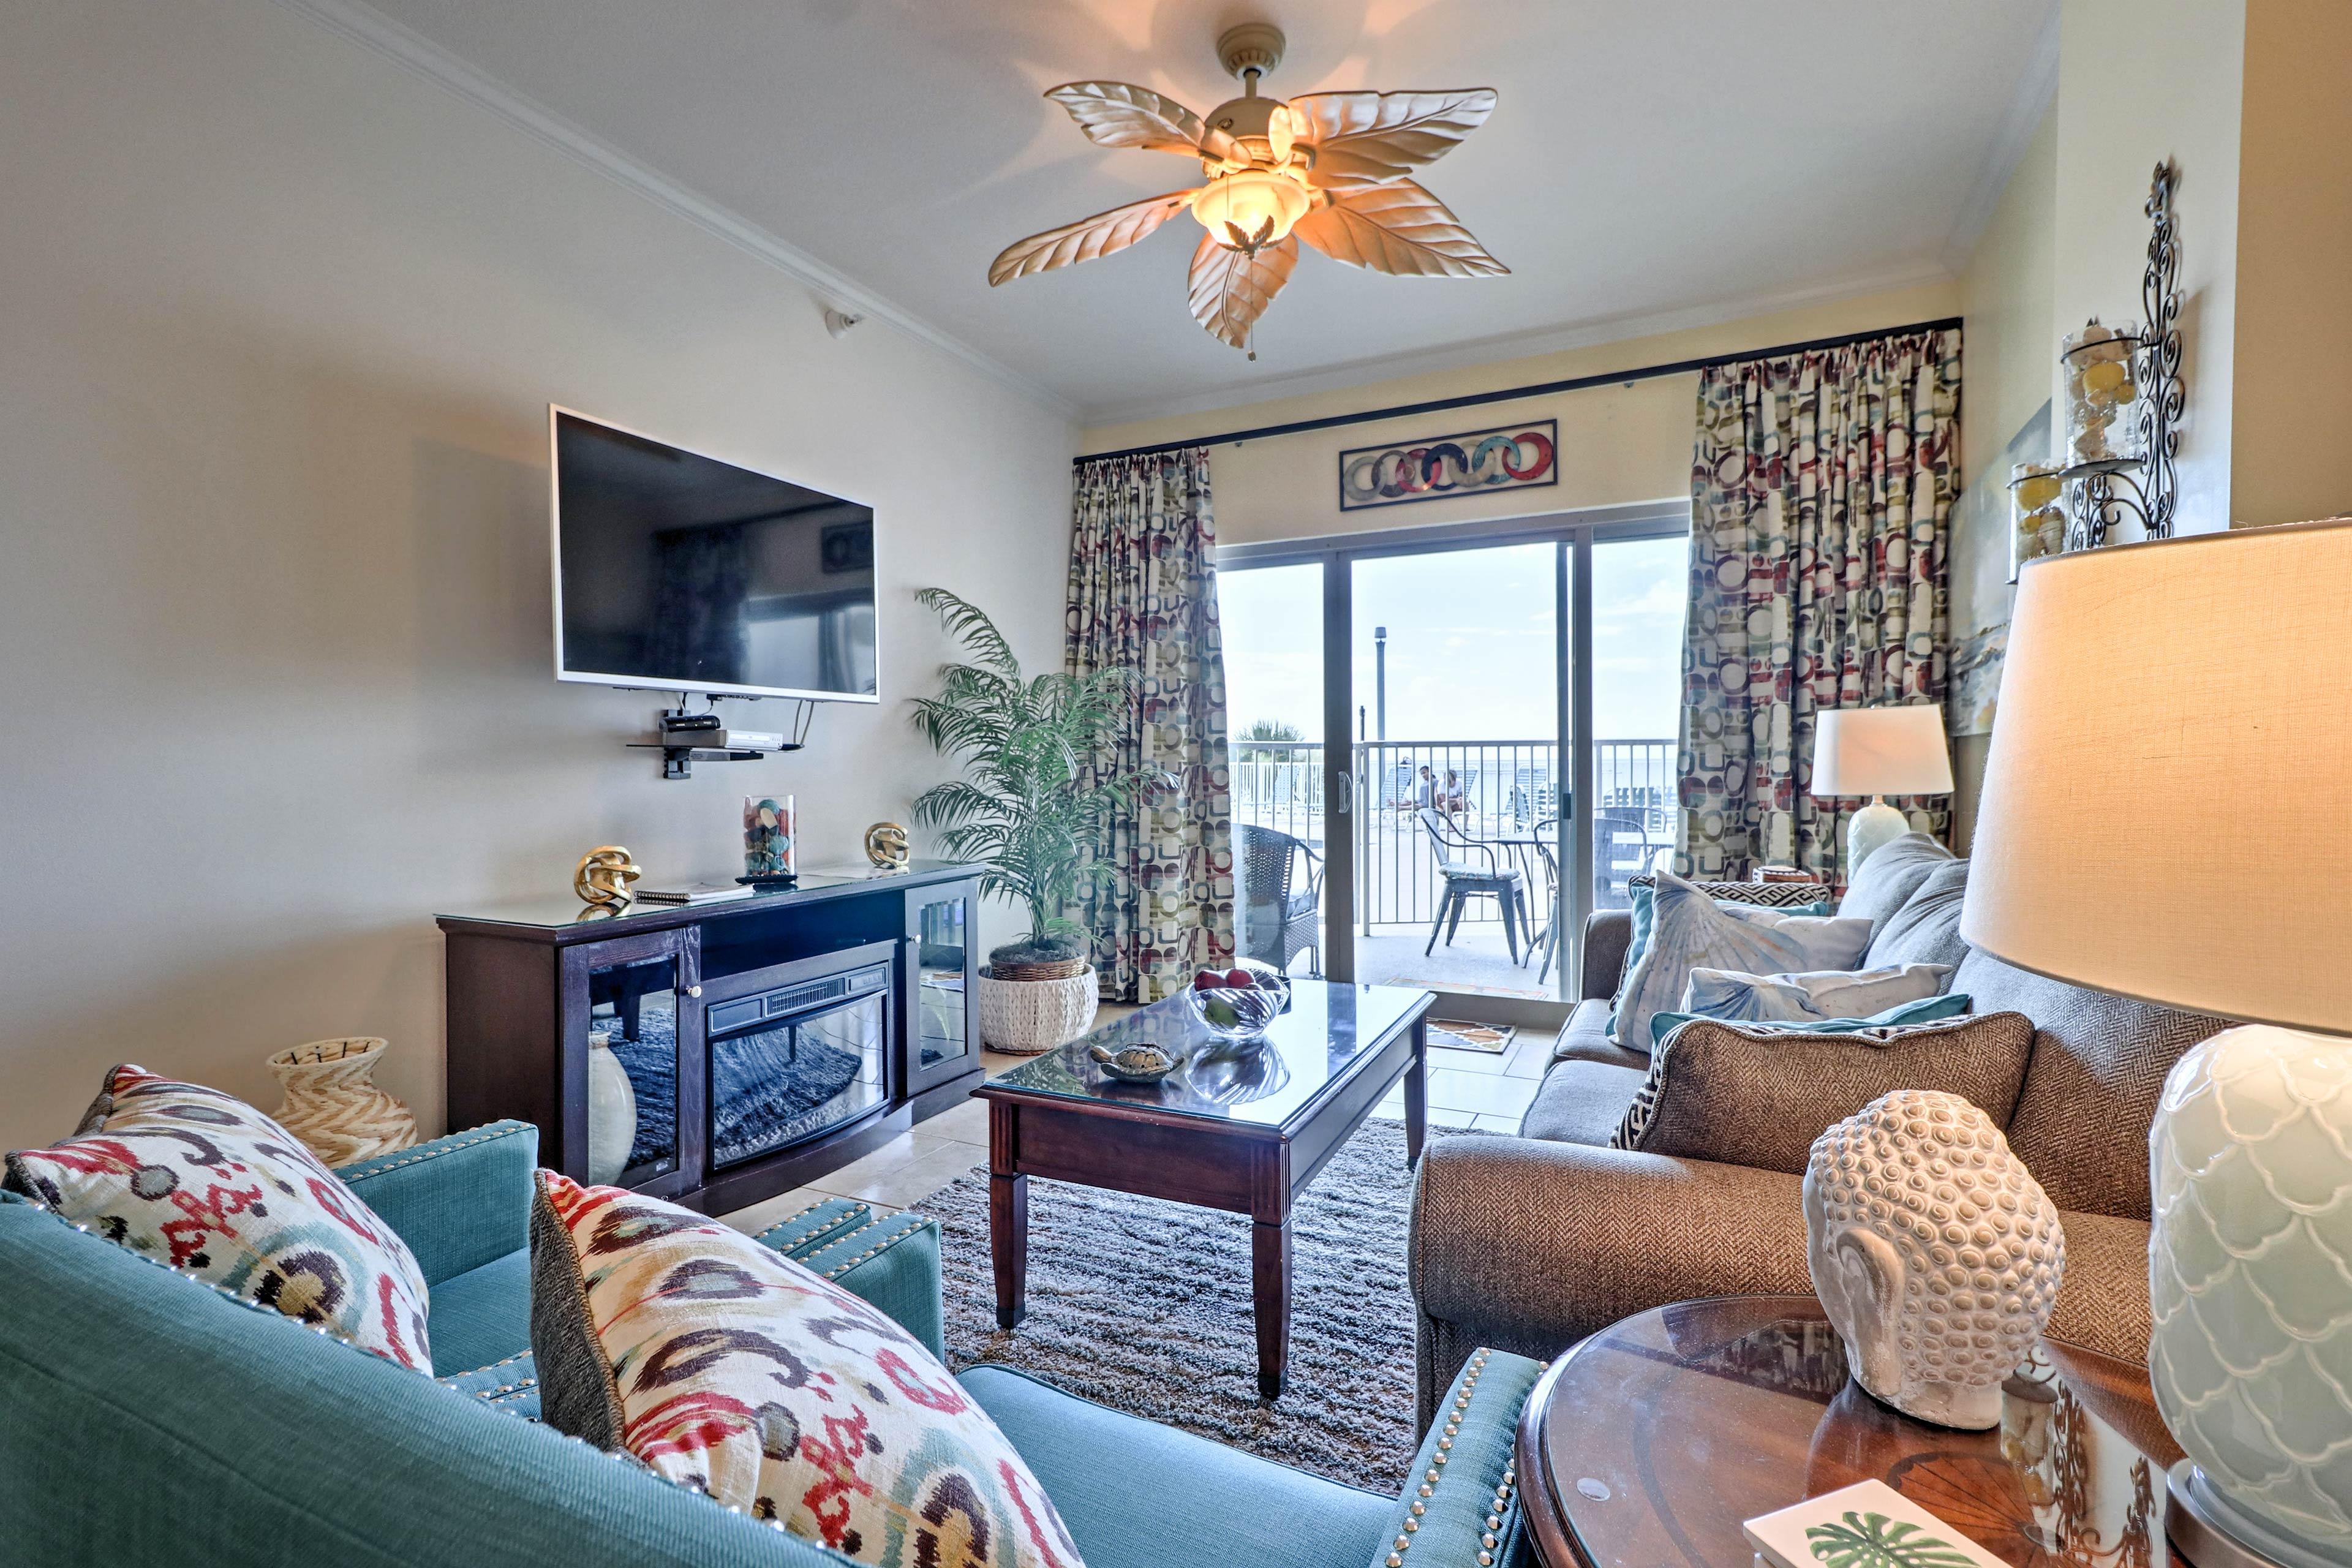 Plan your next Biloxi getaway to this outstanding 2-bed, 2-bath condo!